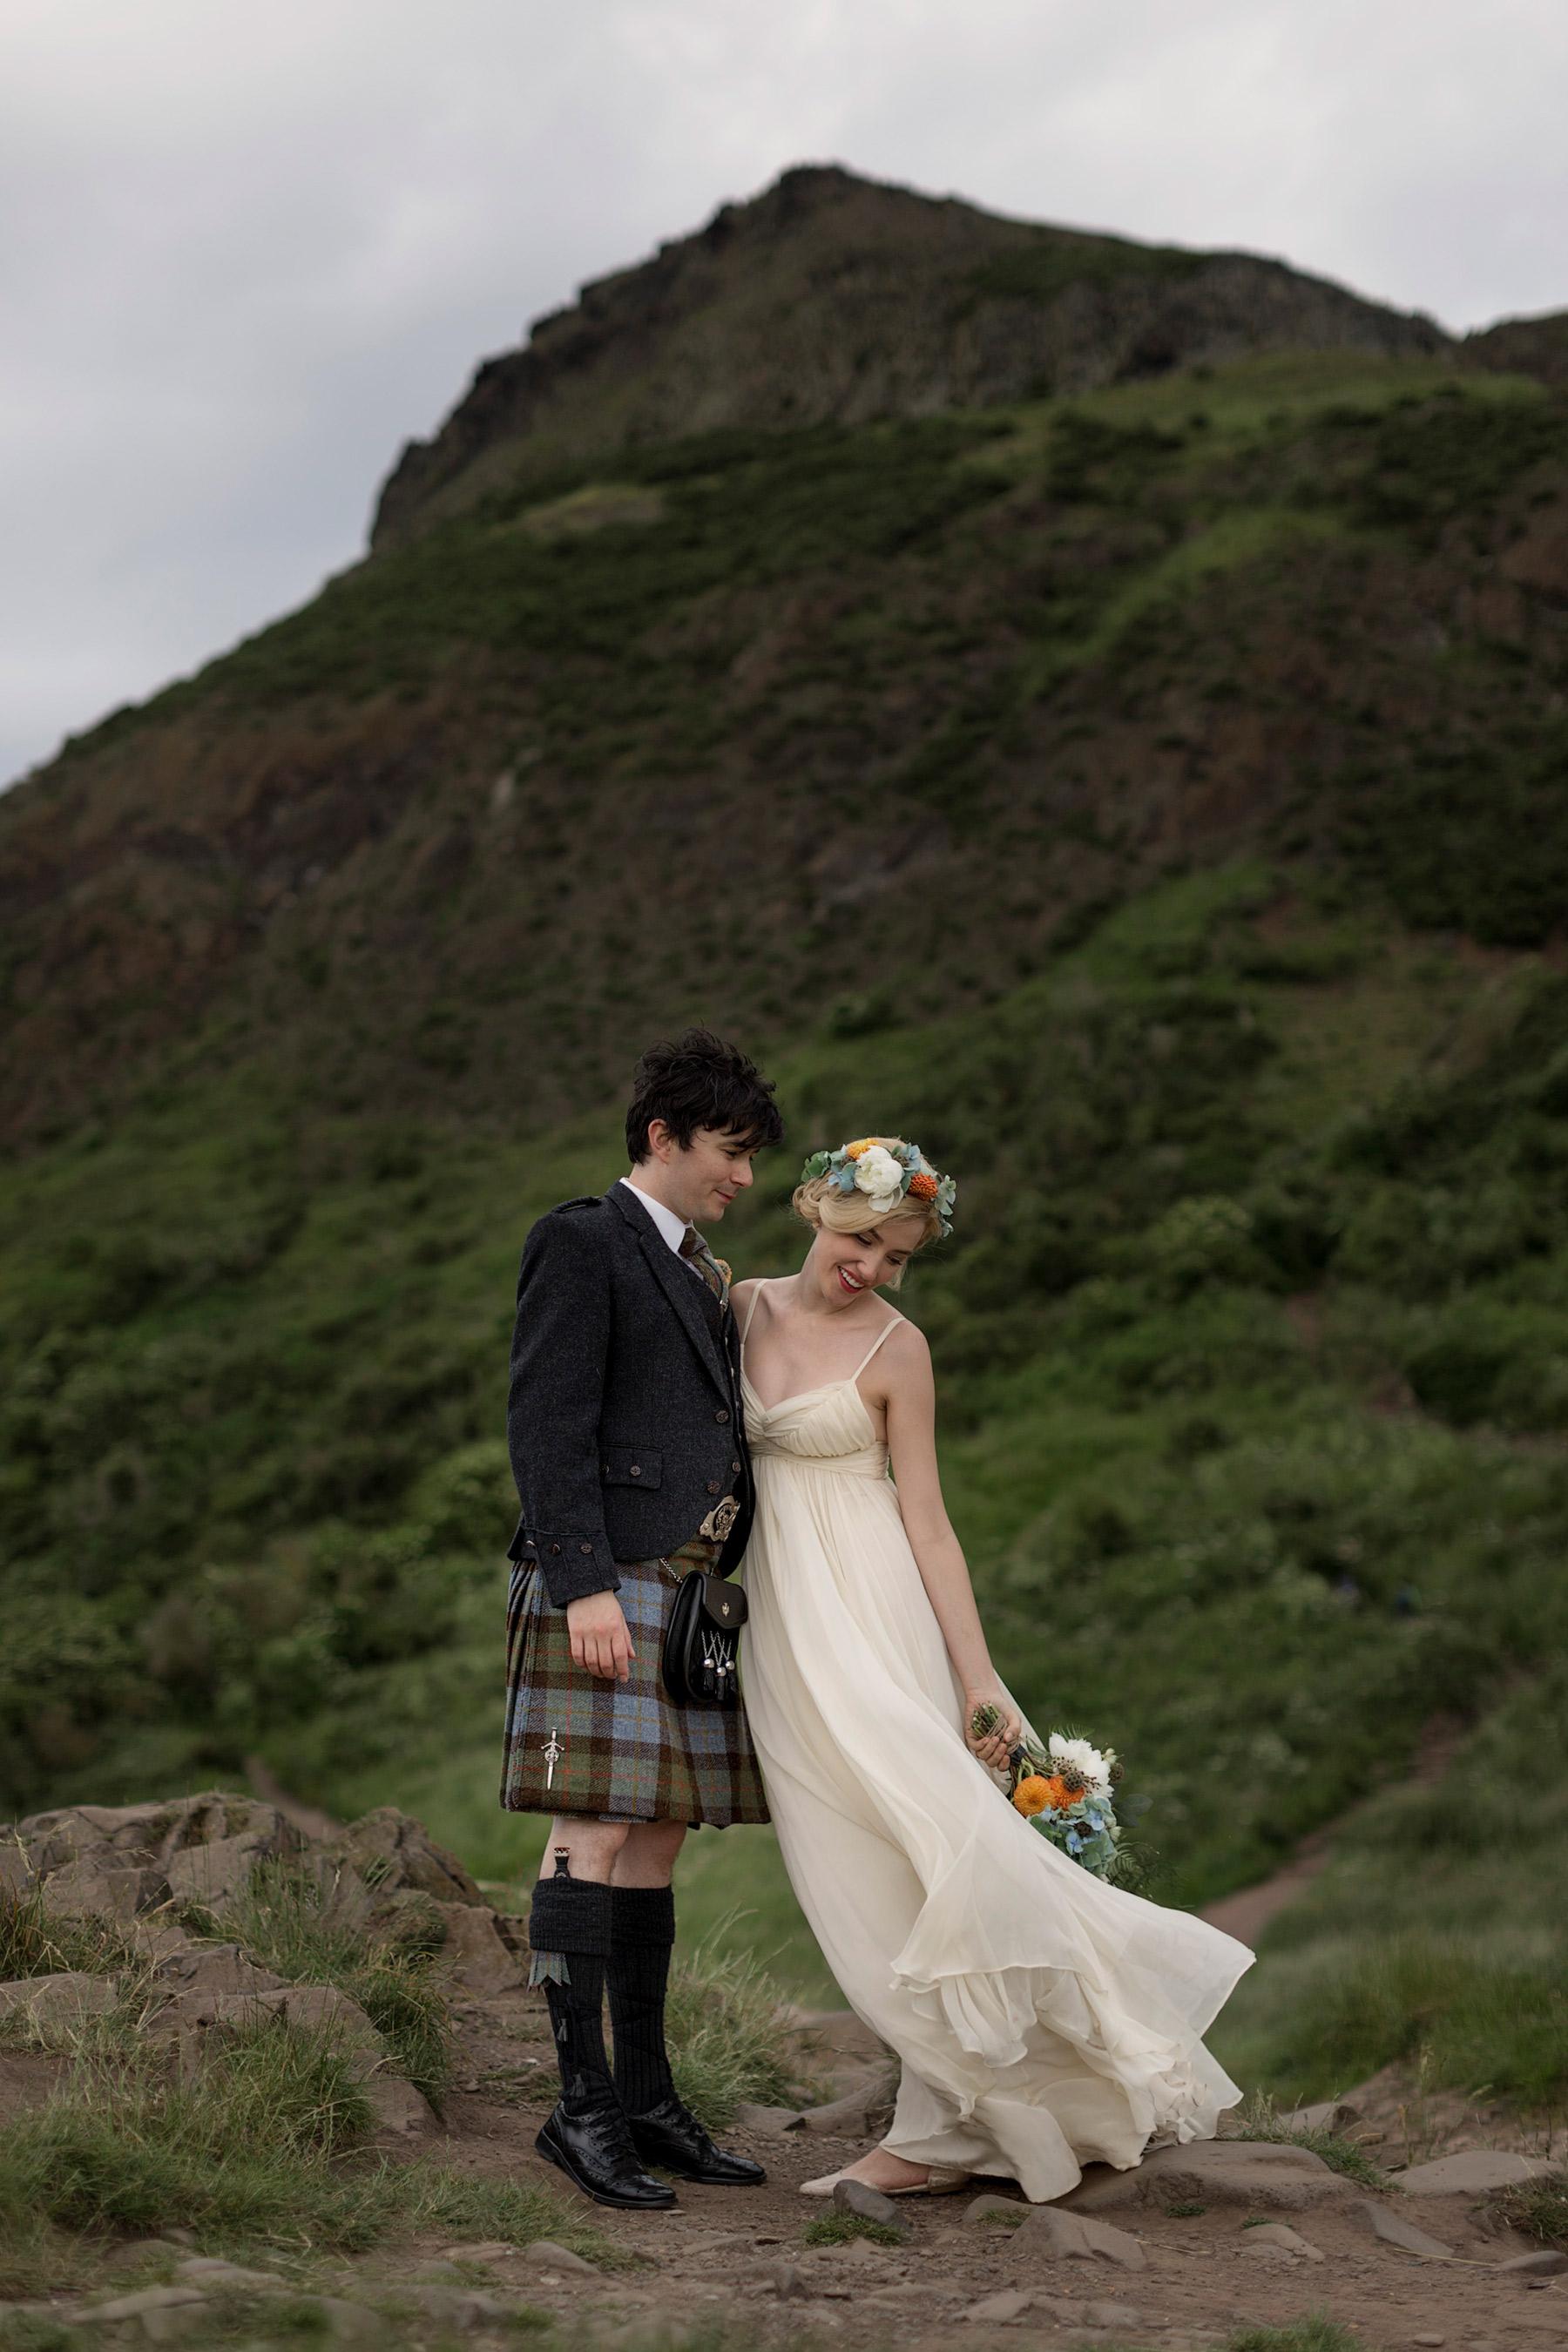 jenni melear & stuart mcleod wedding photo